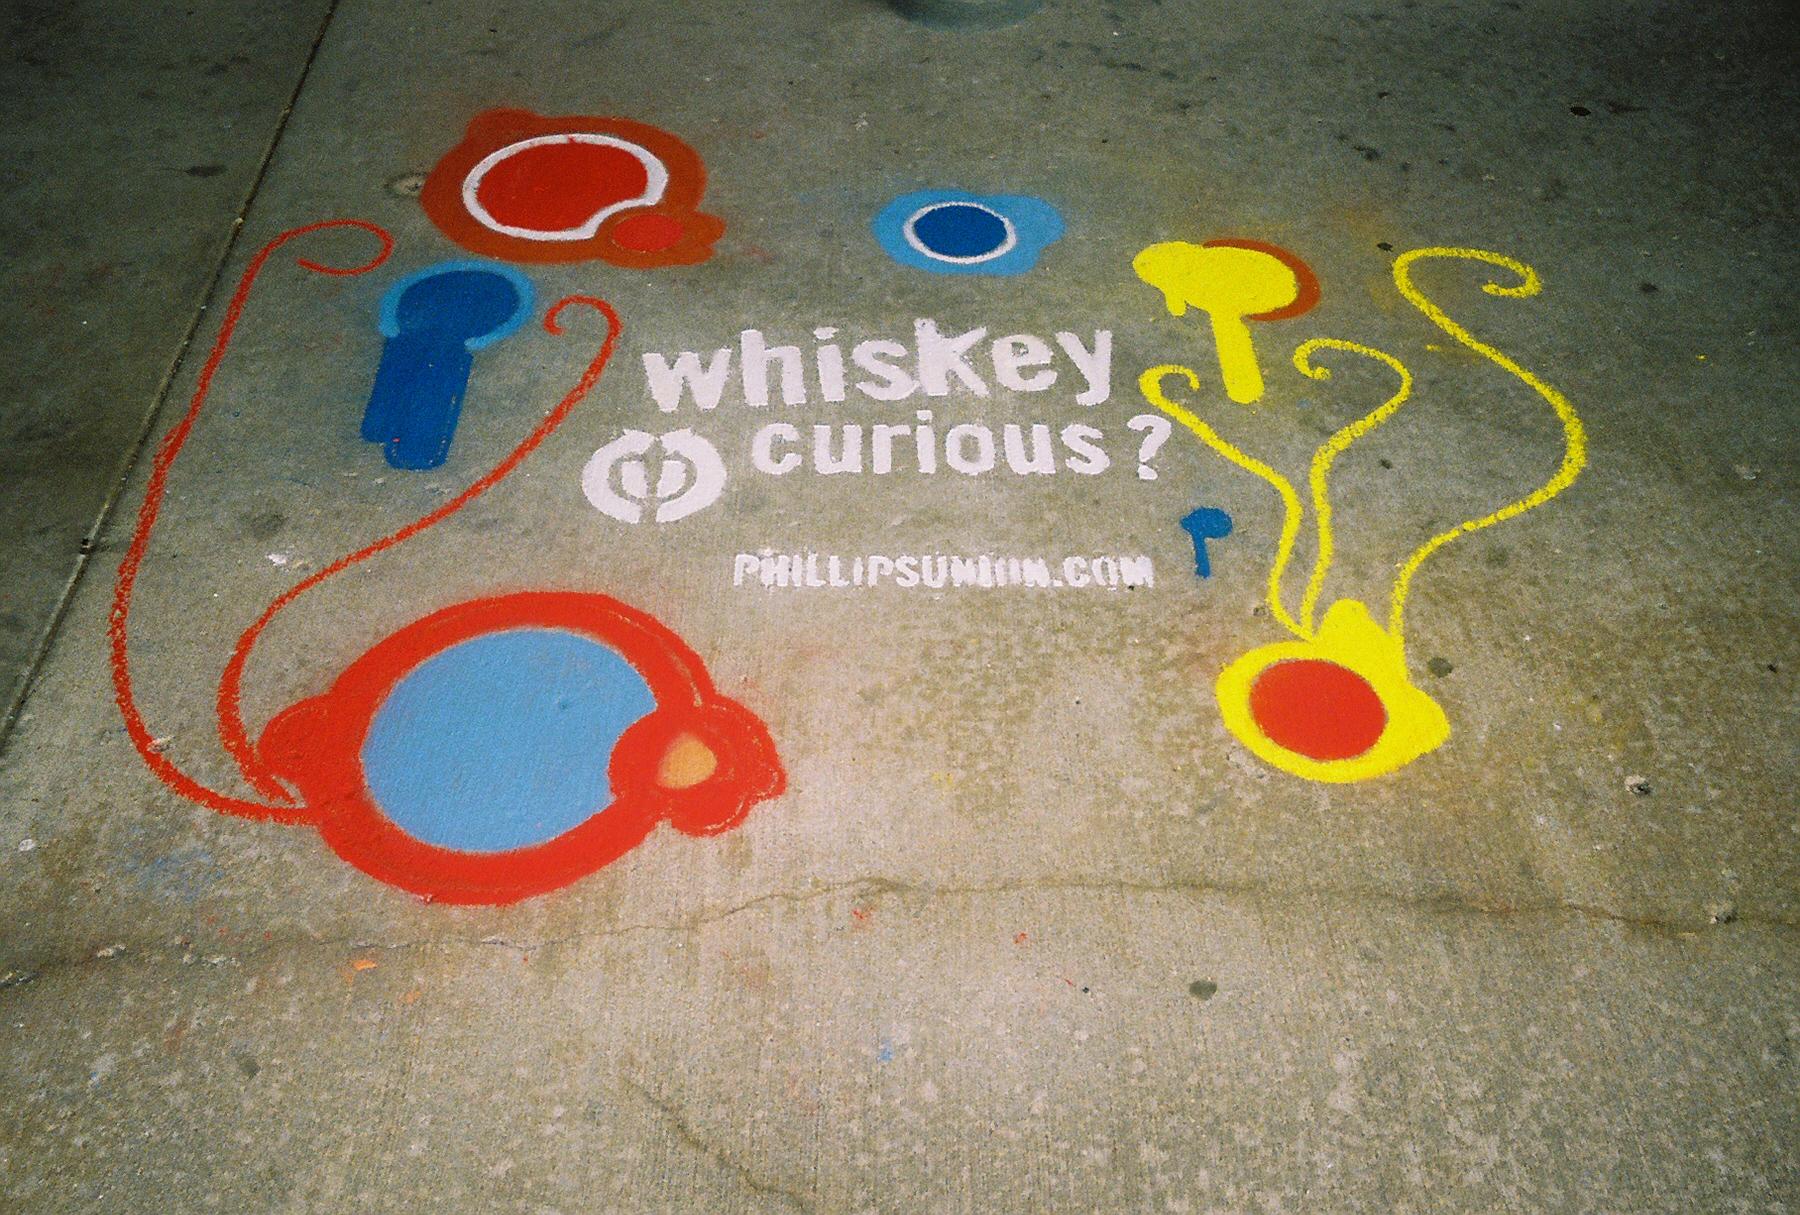 sidewalk chalk advertising